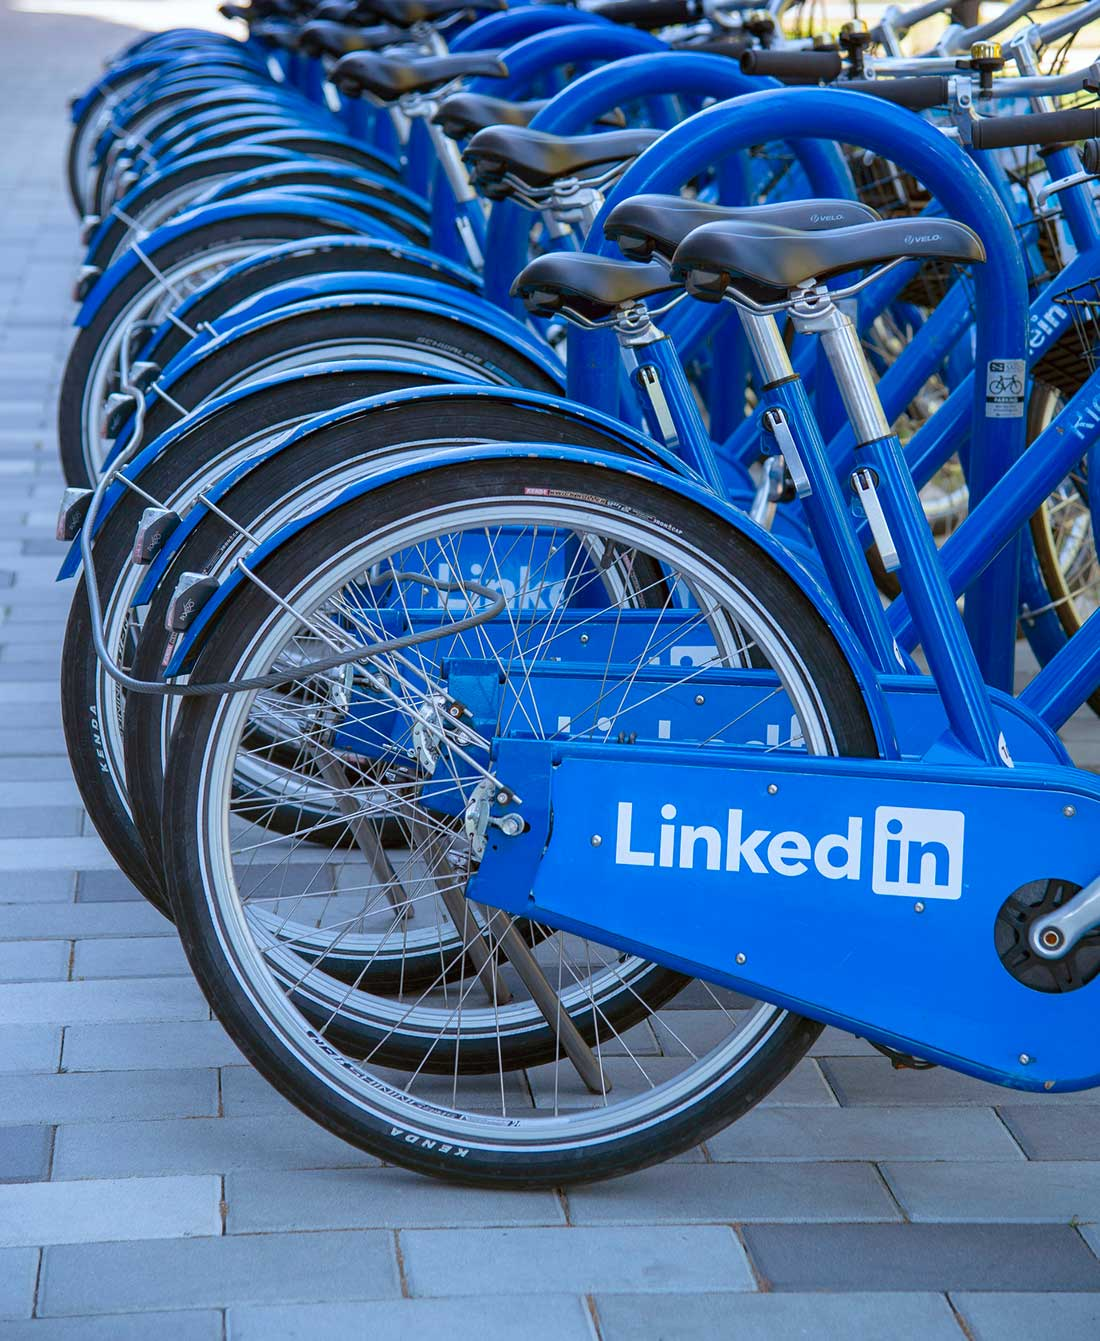 LinkedIn Bikes